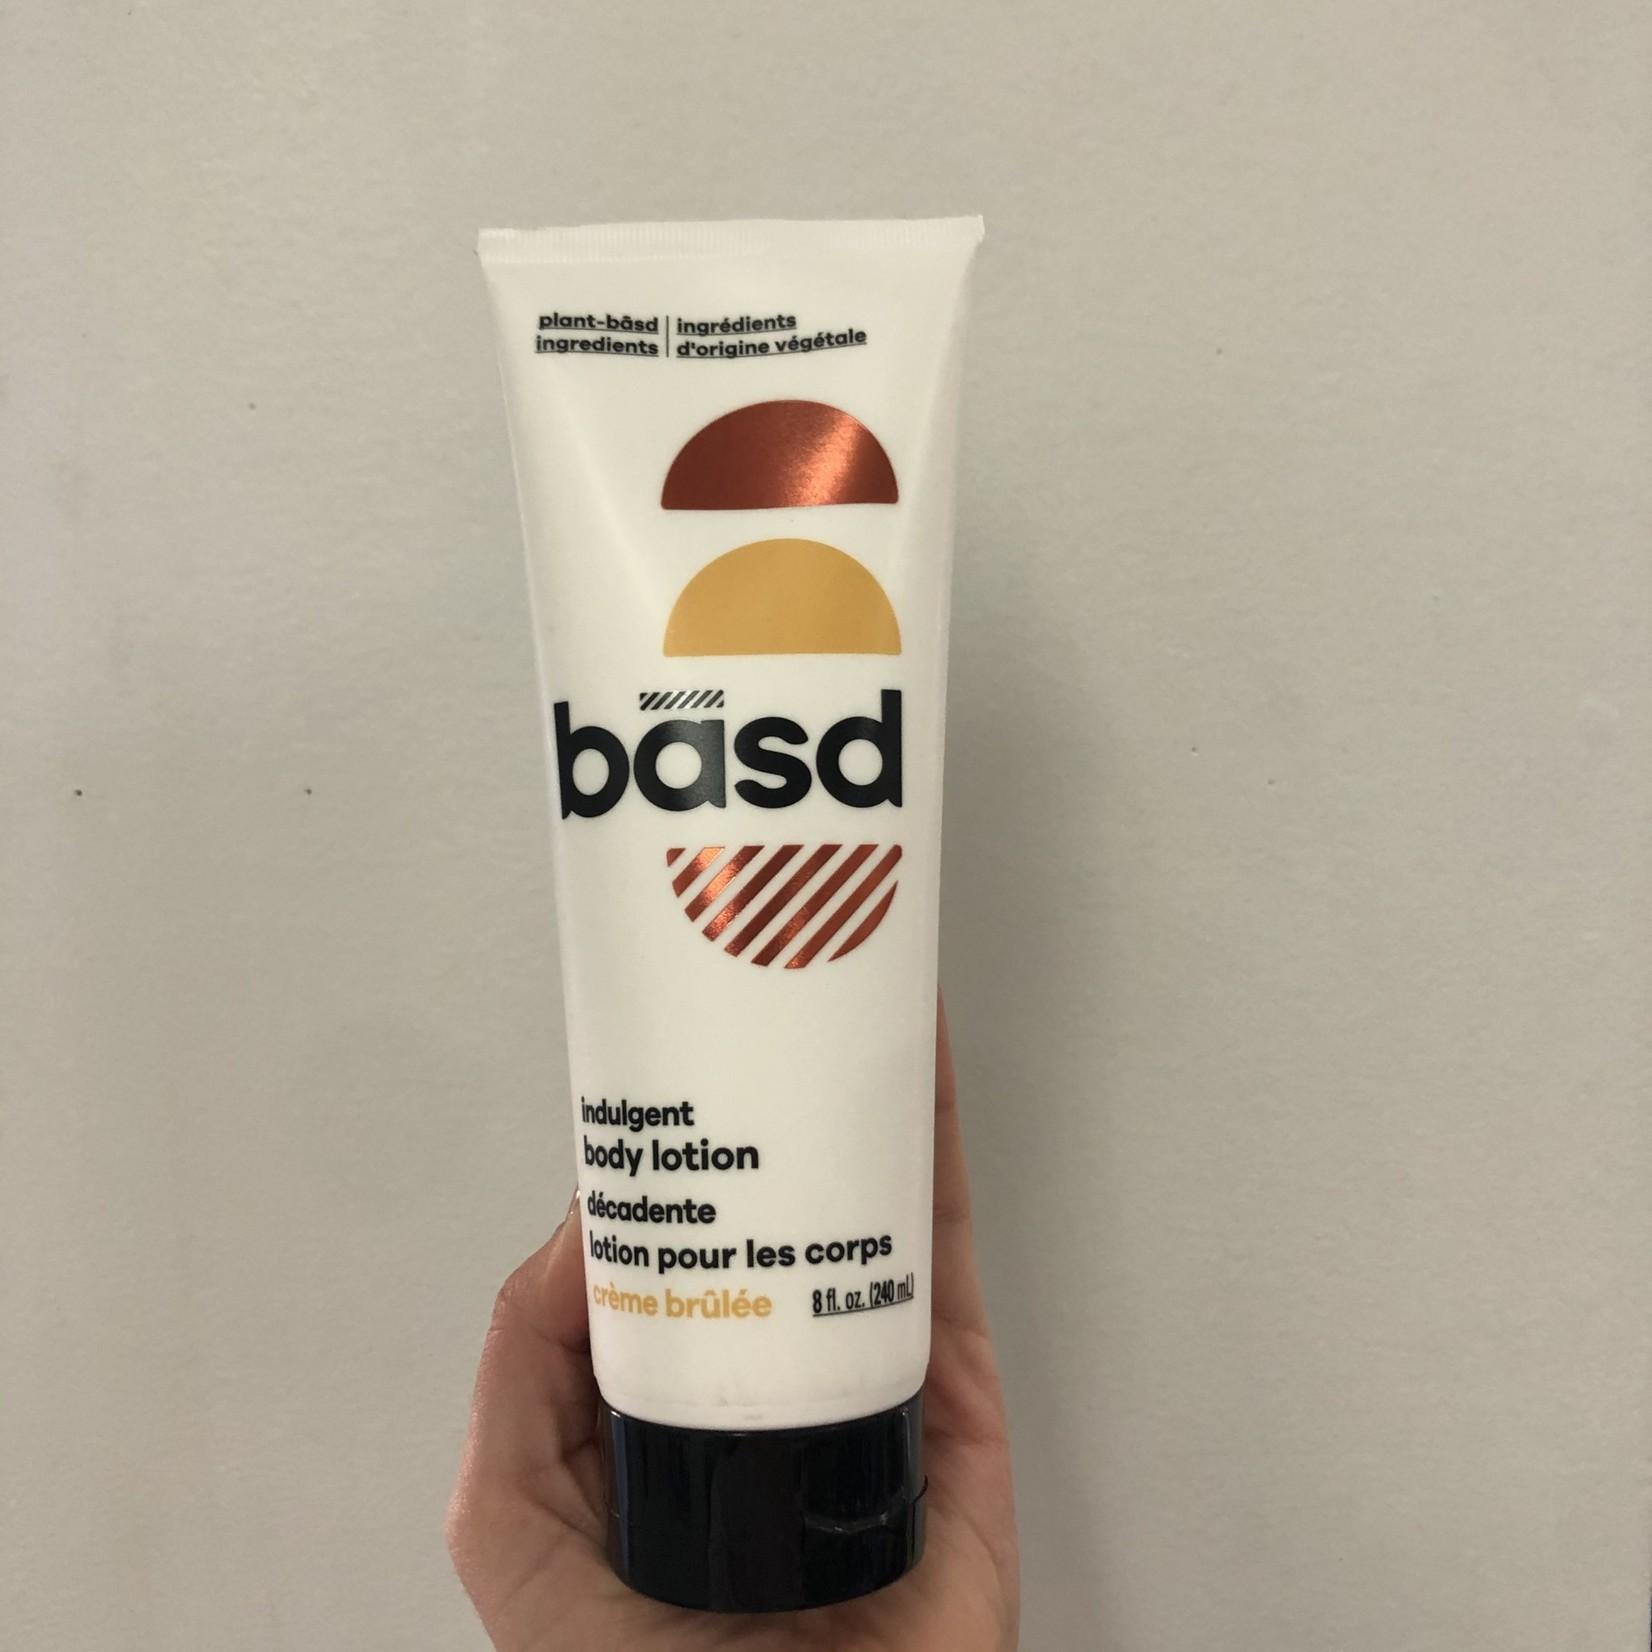 Basd Basd Indulgent Body Lotion Creme Brulee